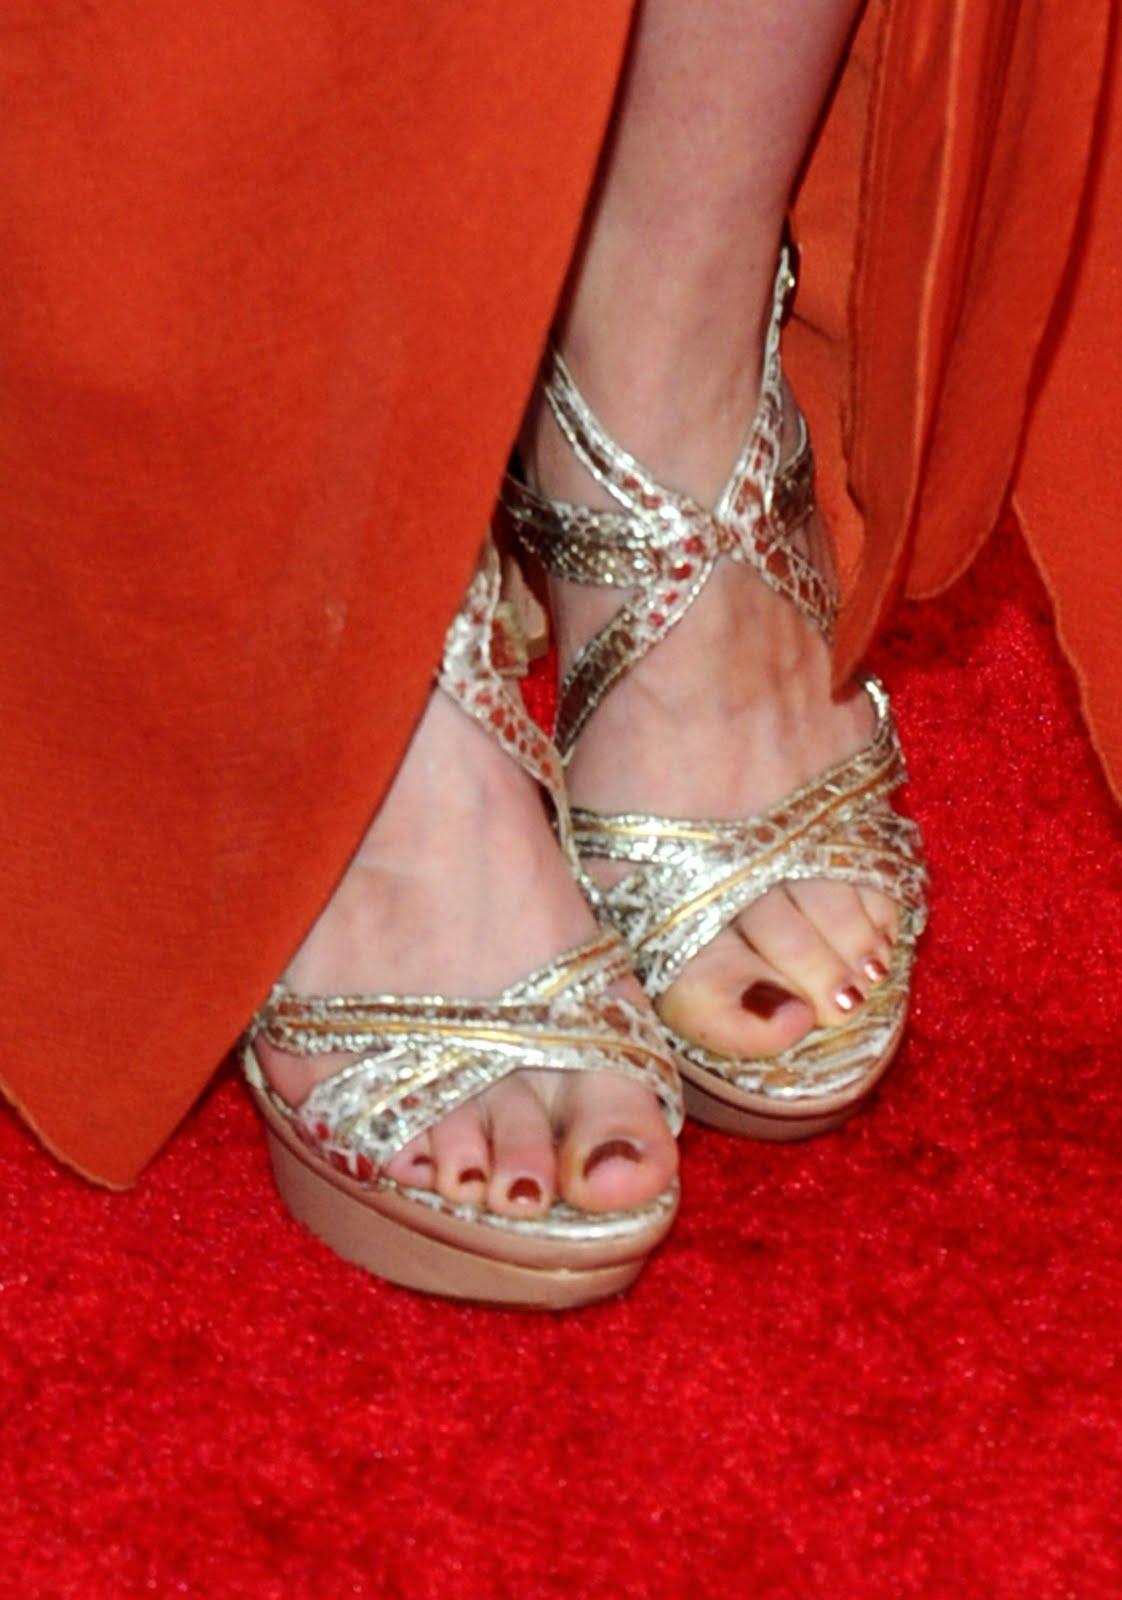 http://4.bp.blogspot.com/_bQ0SqifjNcg/TE_H2XXJroI/AAAAAAAAZlA/d14GjgEmYSw/s1600/amy-smart-feet.jpg